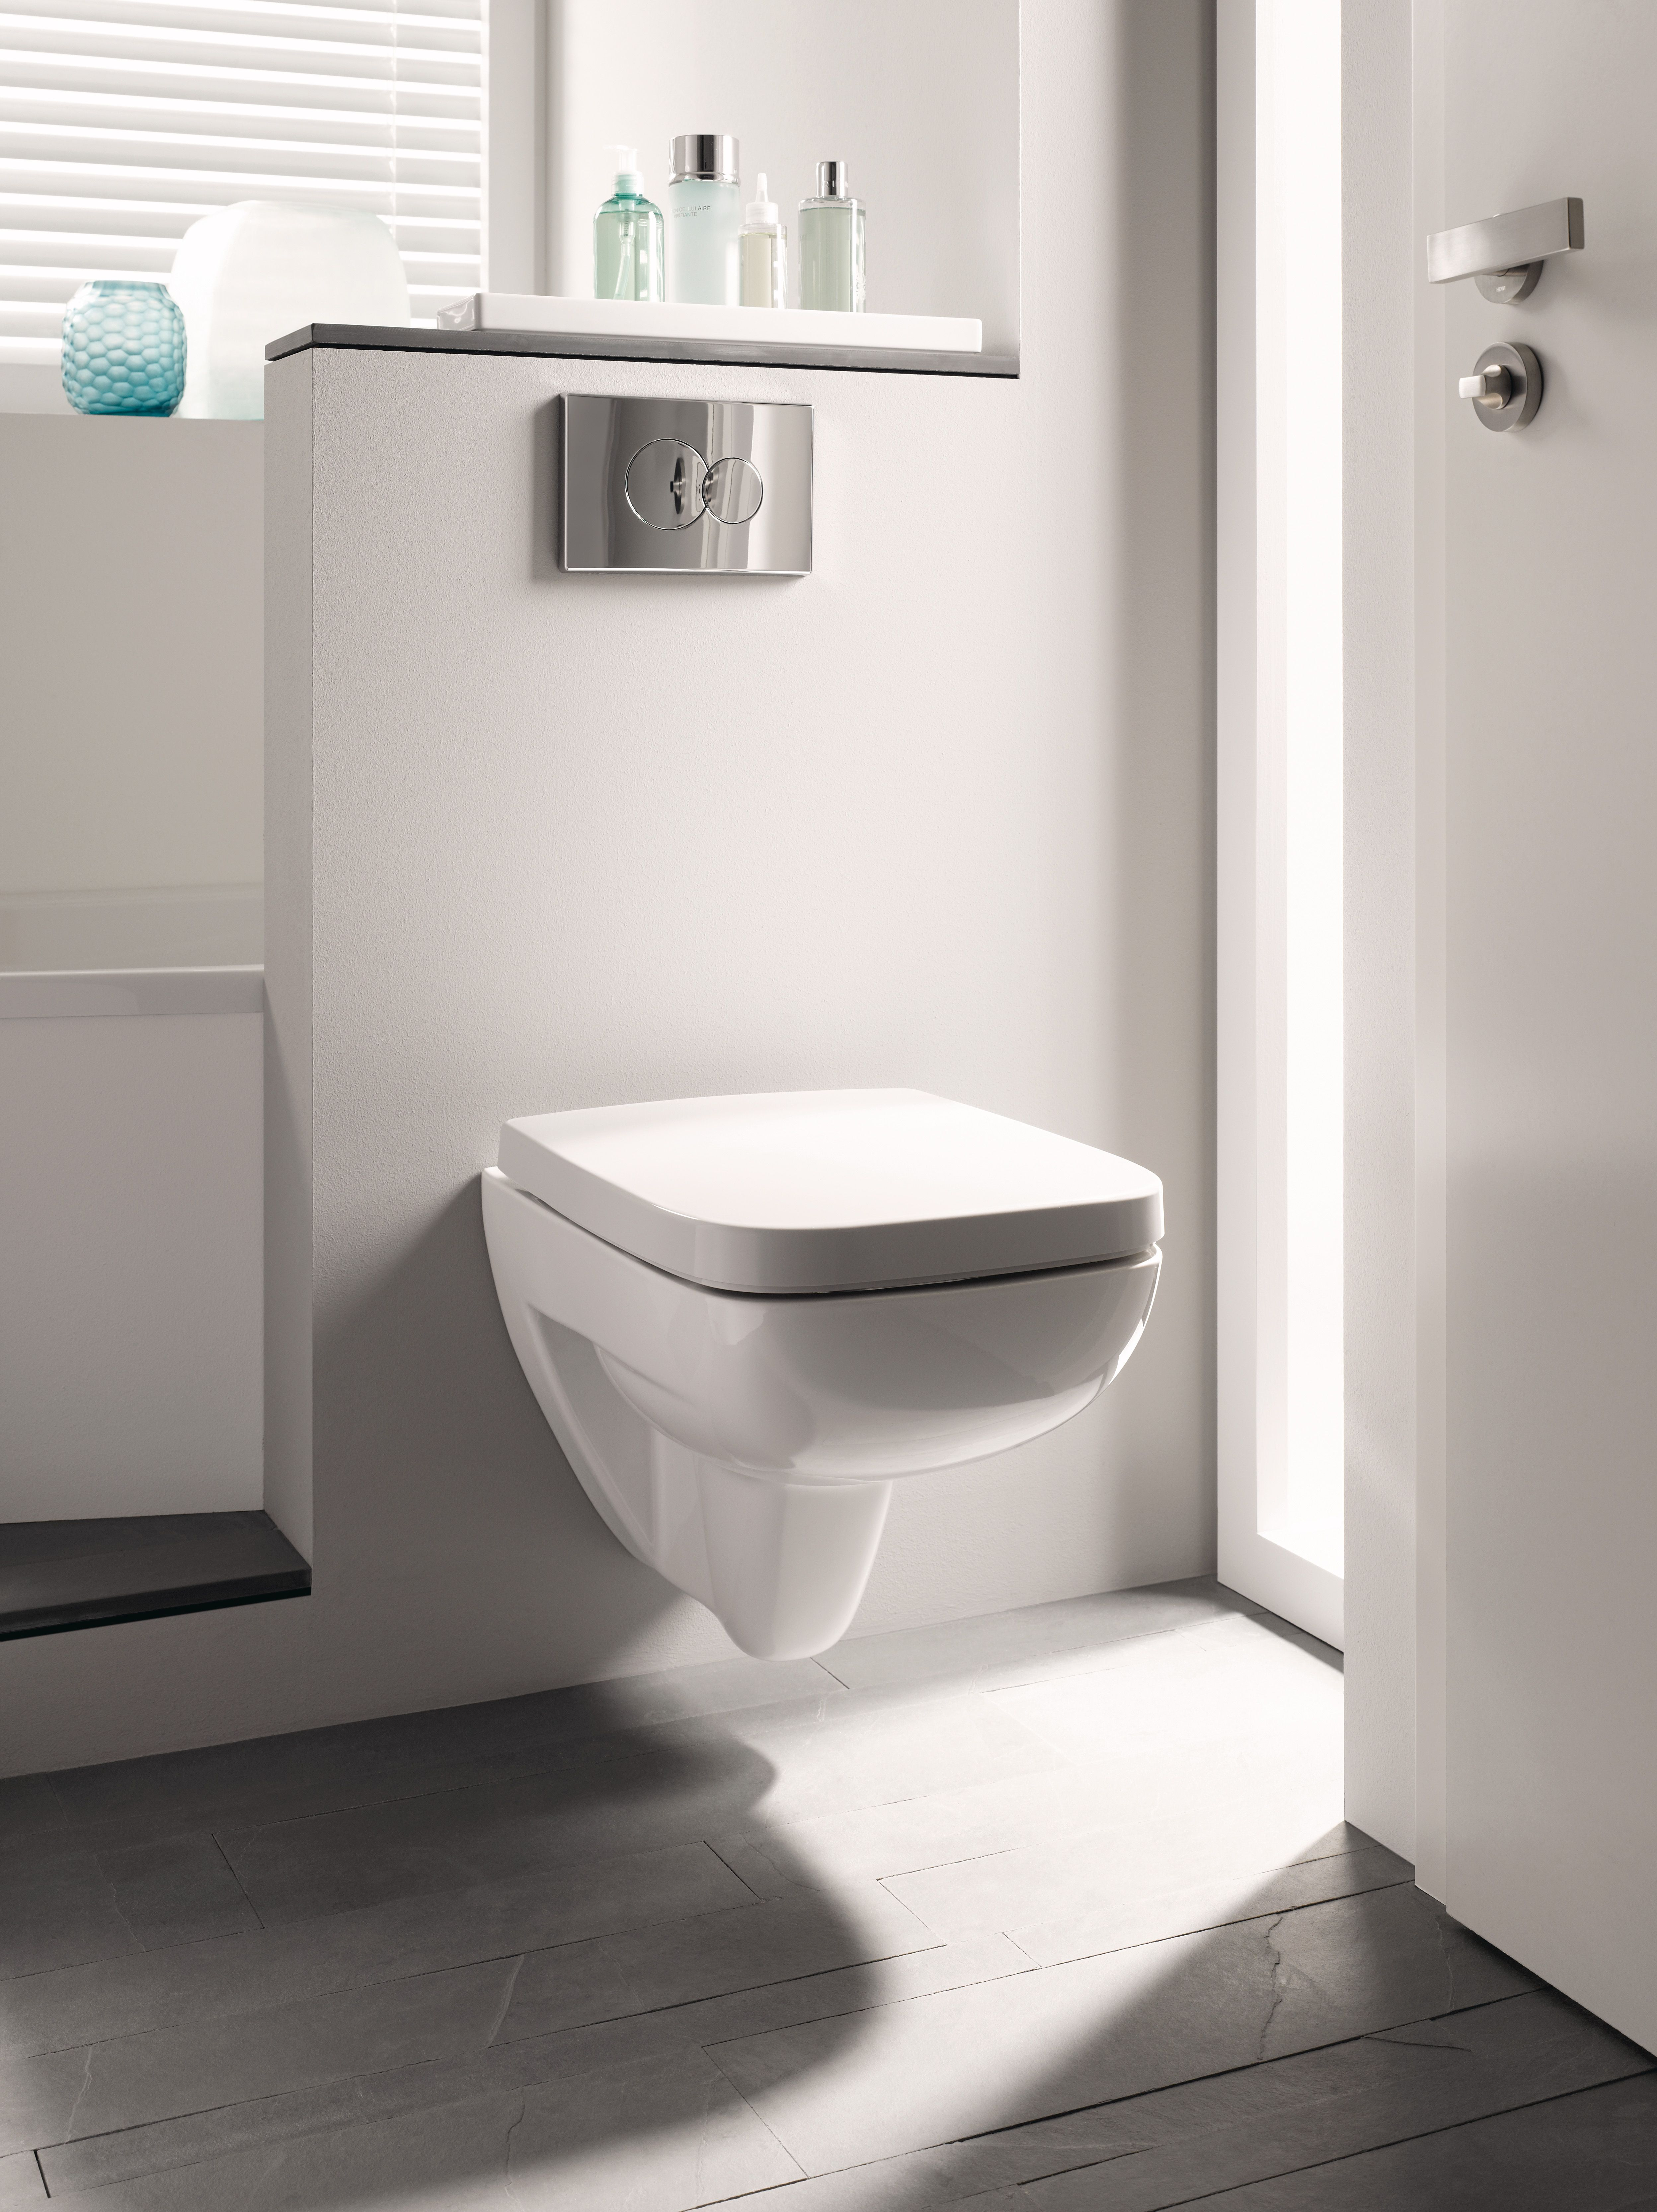 Sphinx 320 toilet http://www.badkamerwinkel.nl/shop/sphinx/320 ...